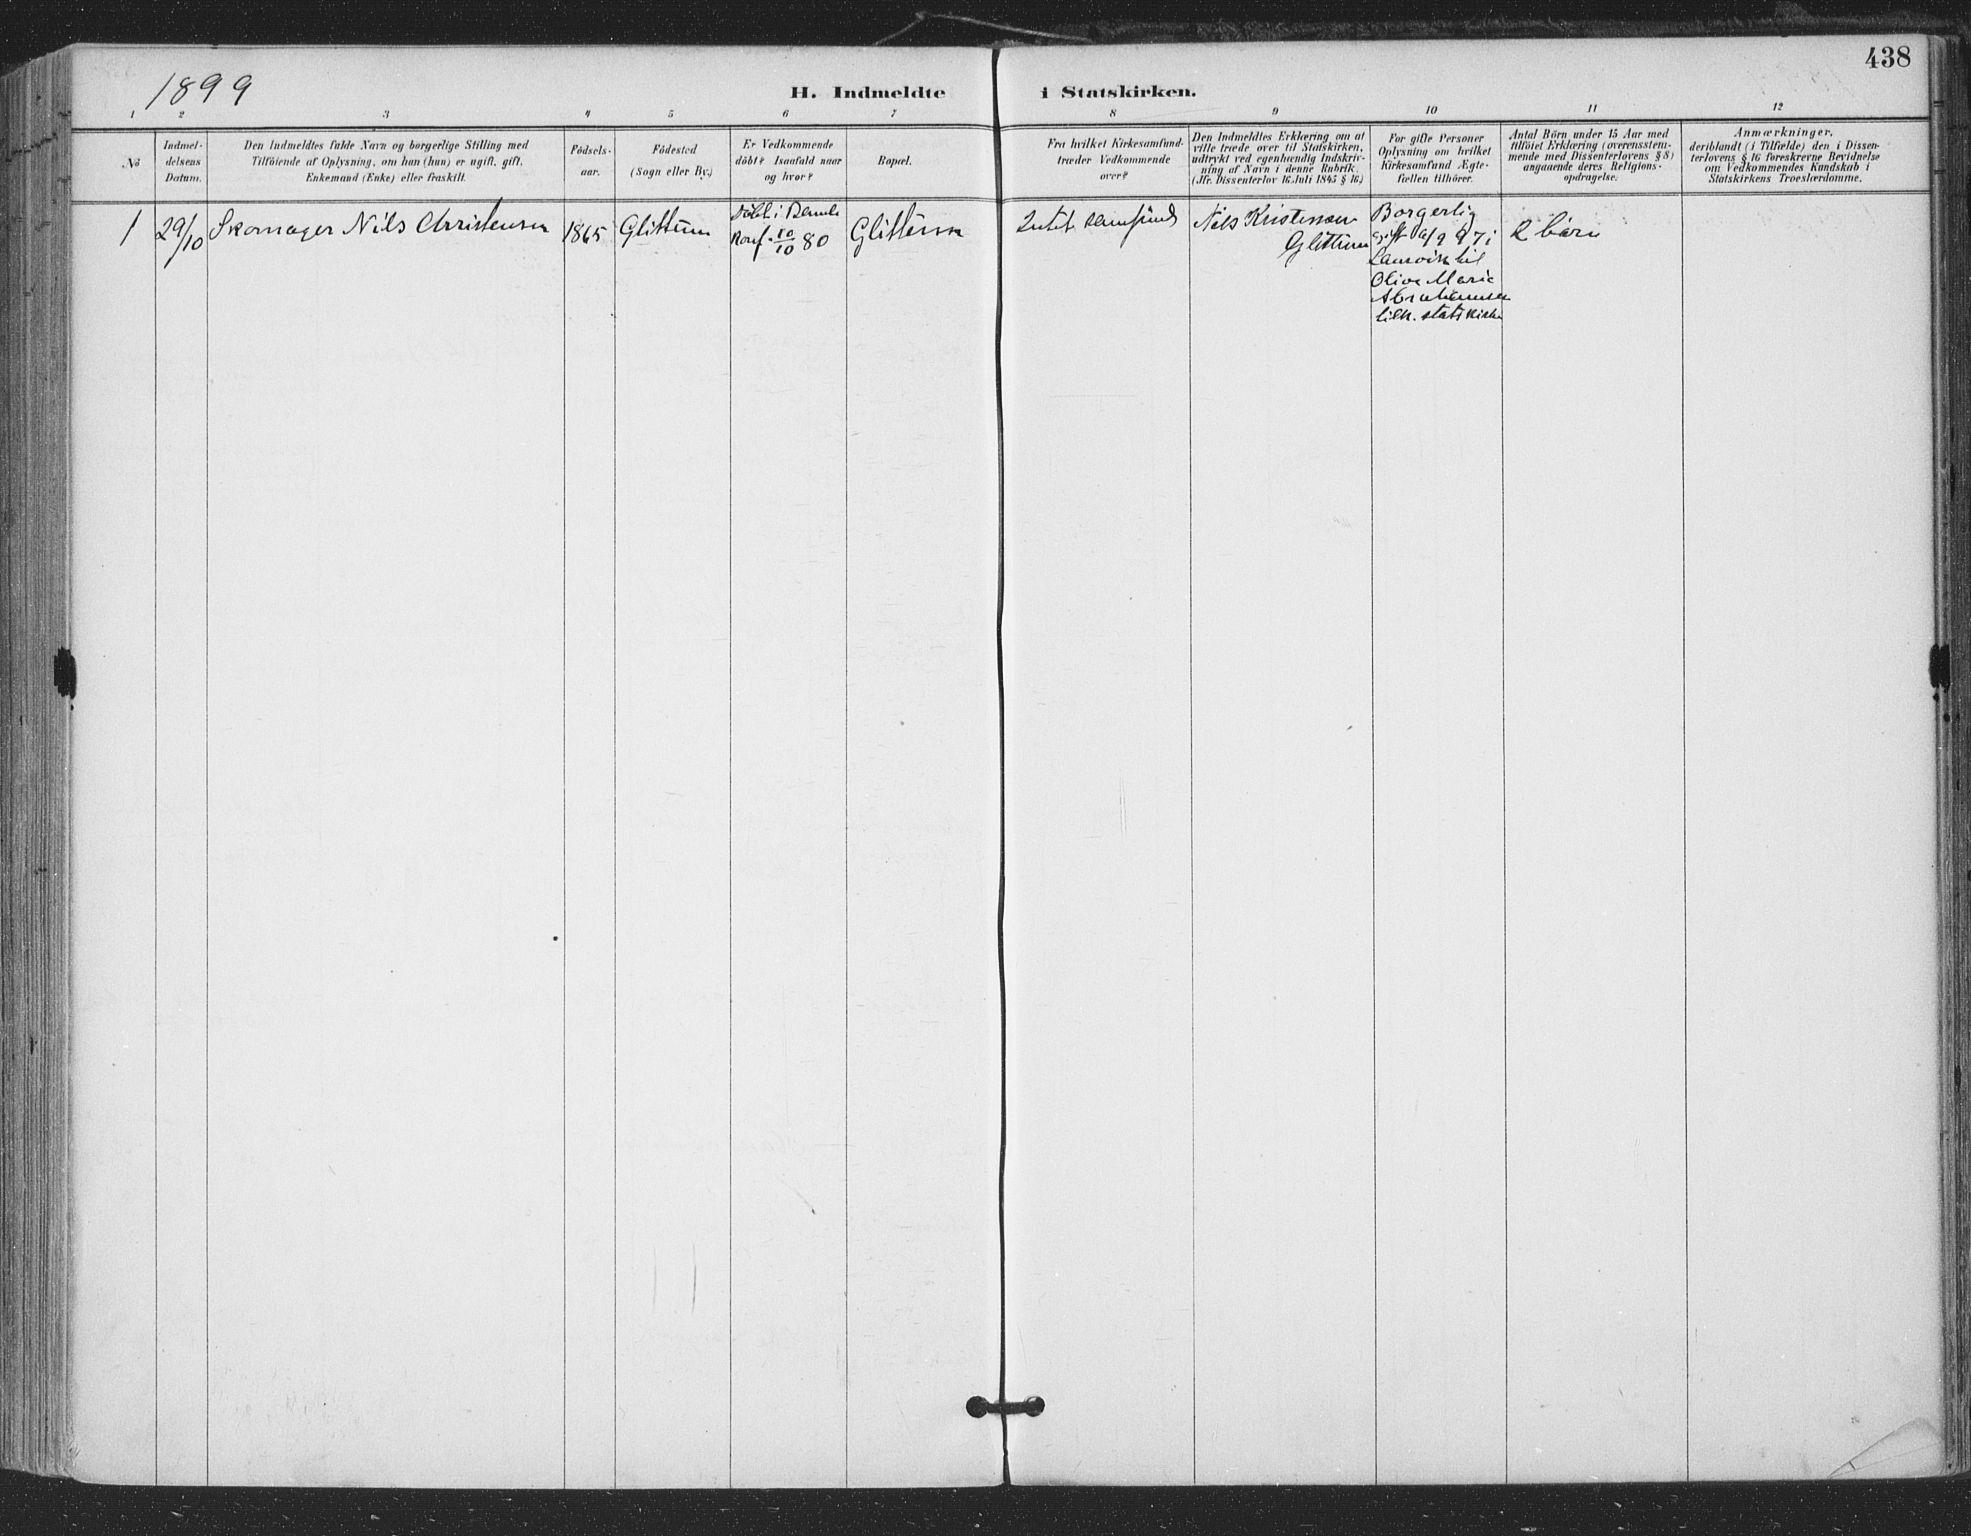 SAKO, Bamble kirkebøker, F/Fa/L0008: Ministerialbok nr. I 8, 1888-1900, s. 438